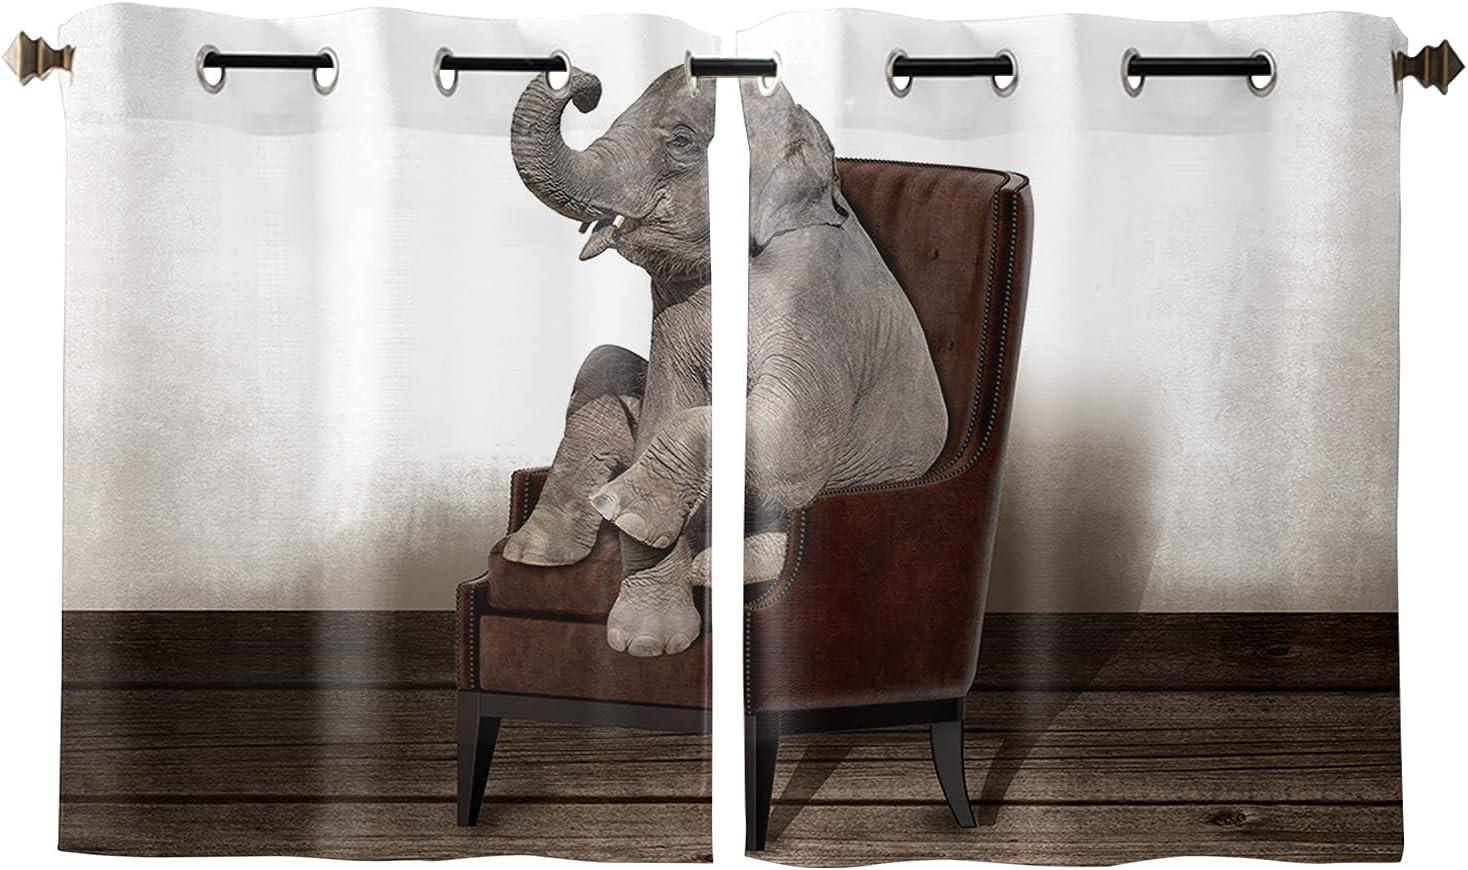 Window Kansas City Mall Curtain online shopping Panels Set of 2 Grommet Curtains Drapes Livi for